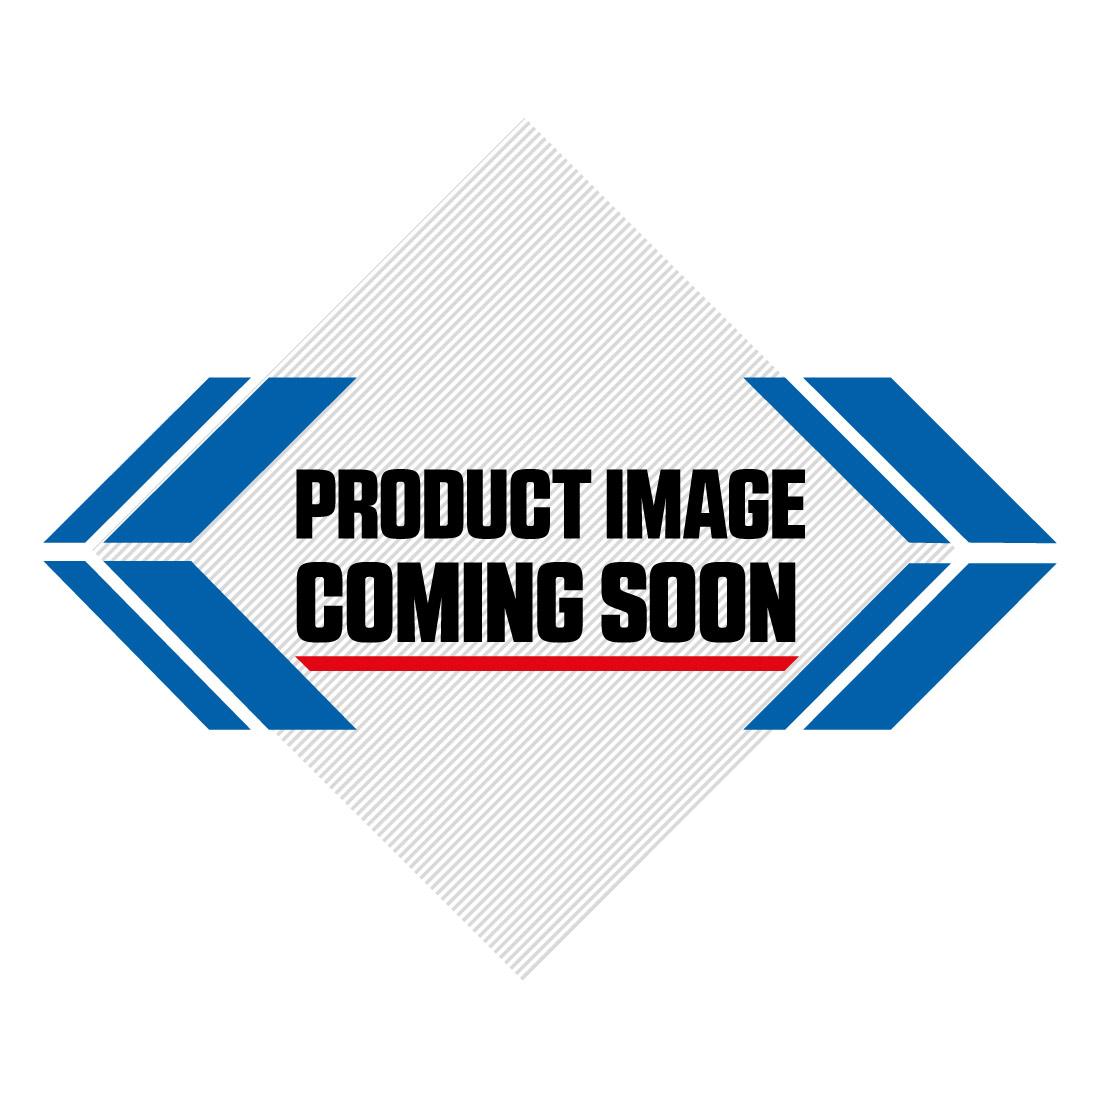 Sidi Crossfire 3 SRS Motocross Boots - TC222 Cairoli LTD Edition Image-2